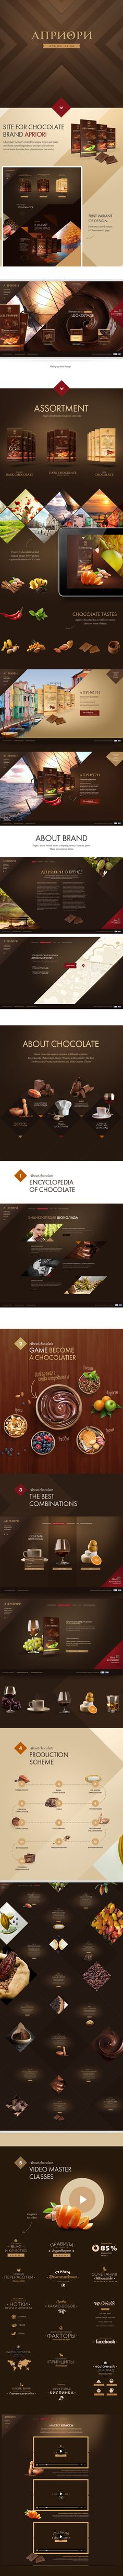 Apriori by Sasha Vinogradova, via Behance #chocolate